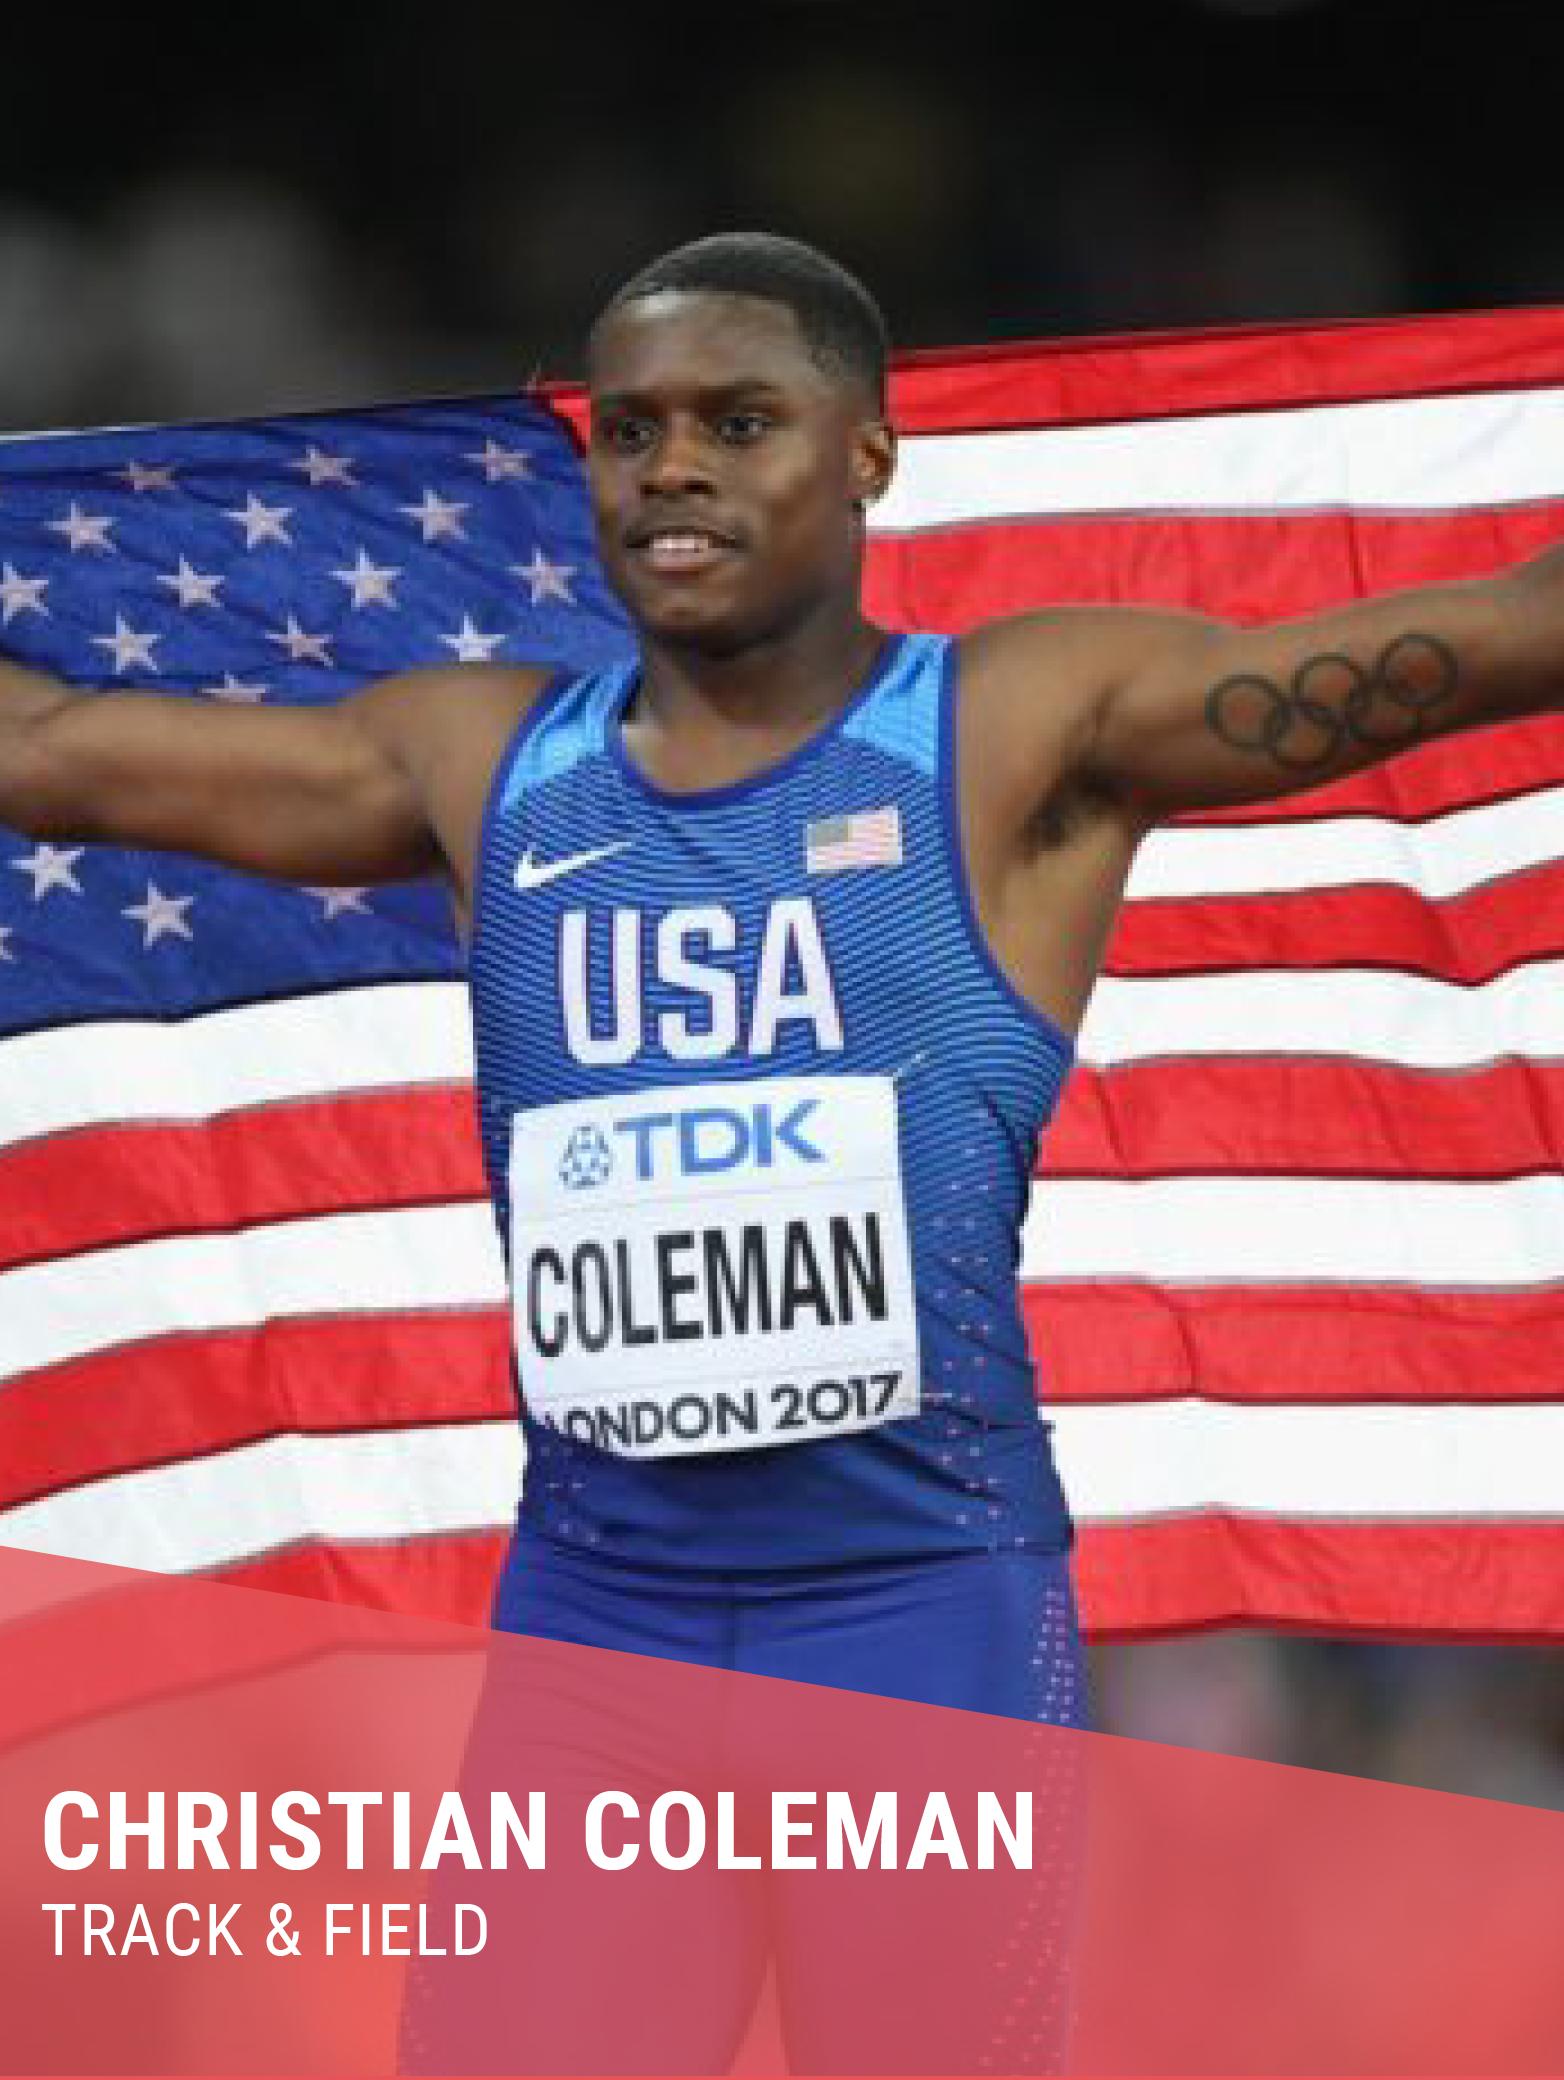 CHRISTIAN COLEMAN  Hometown:Atlanta, GA  College: University of Tennessee  Olympian & World Champion  Instagram:  @_coleman2   Twitter:  @__coleman   Facebook:  @christian.coleman.106